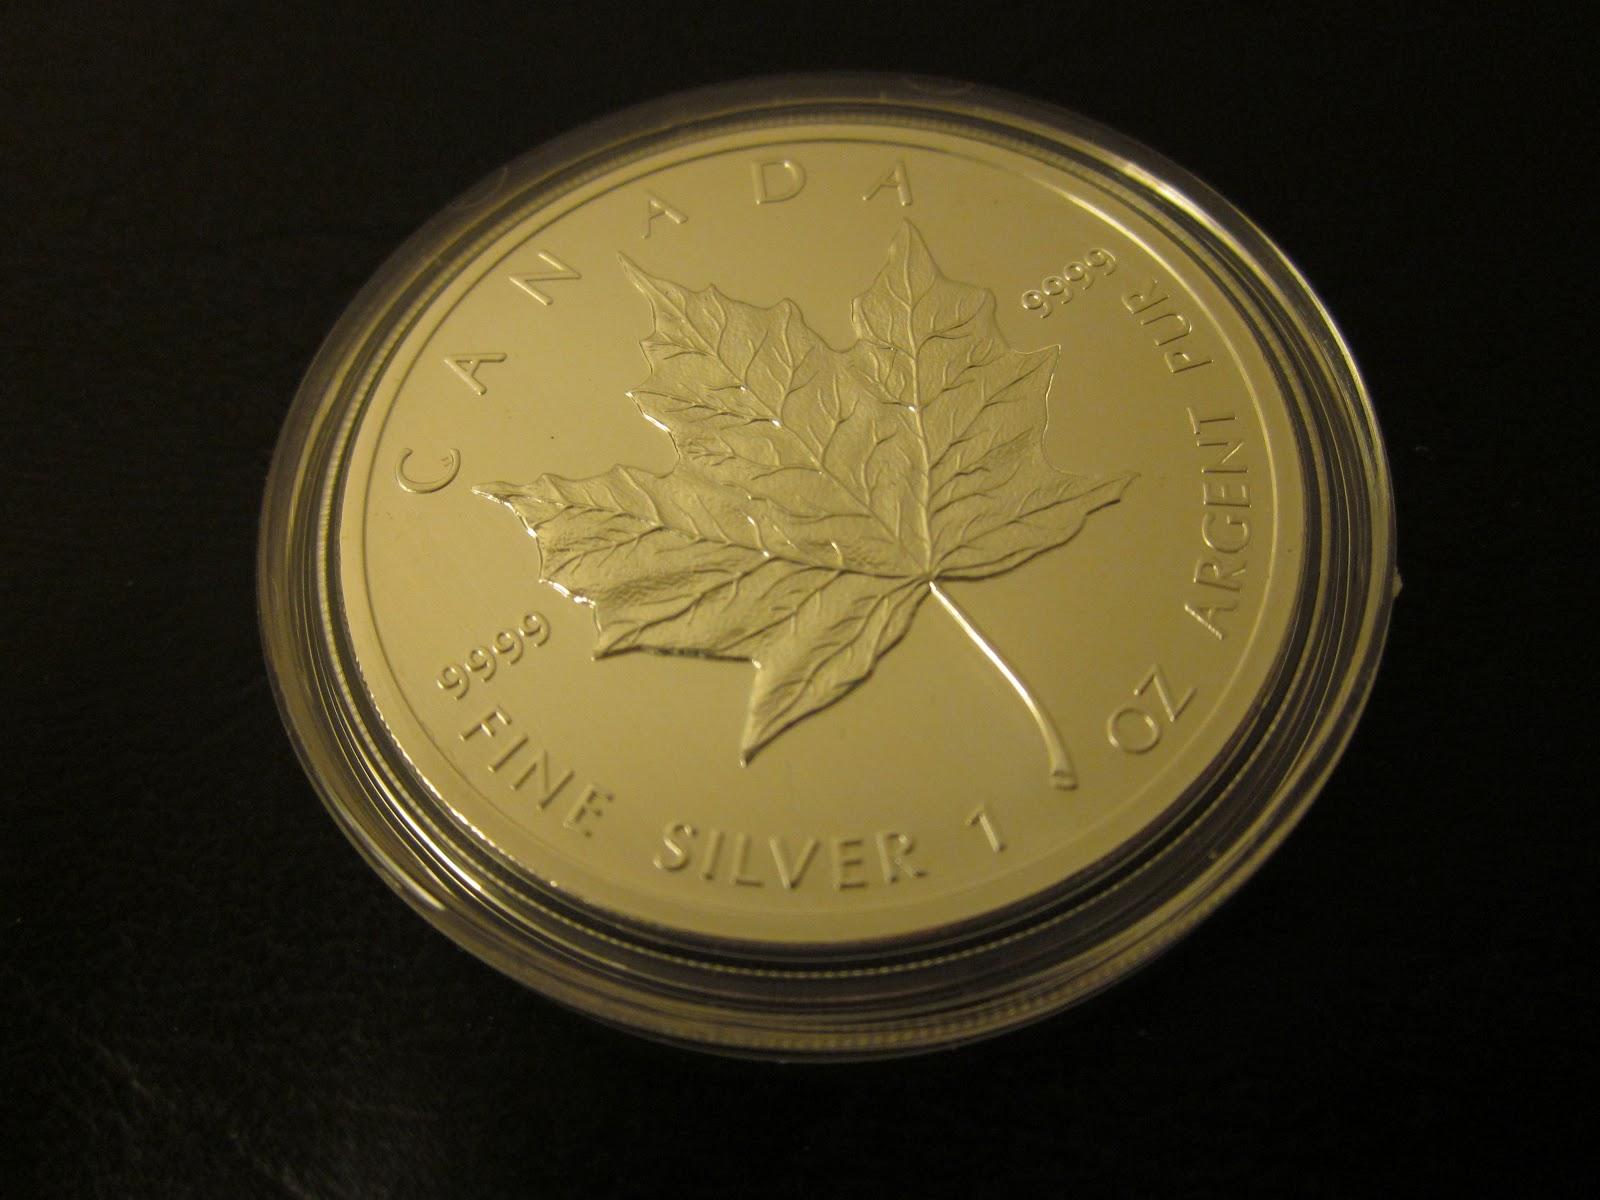 Where to buy silver bullion coins? | TheFinance sg